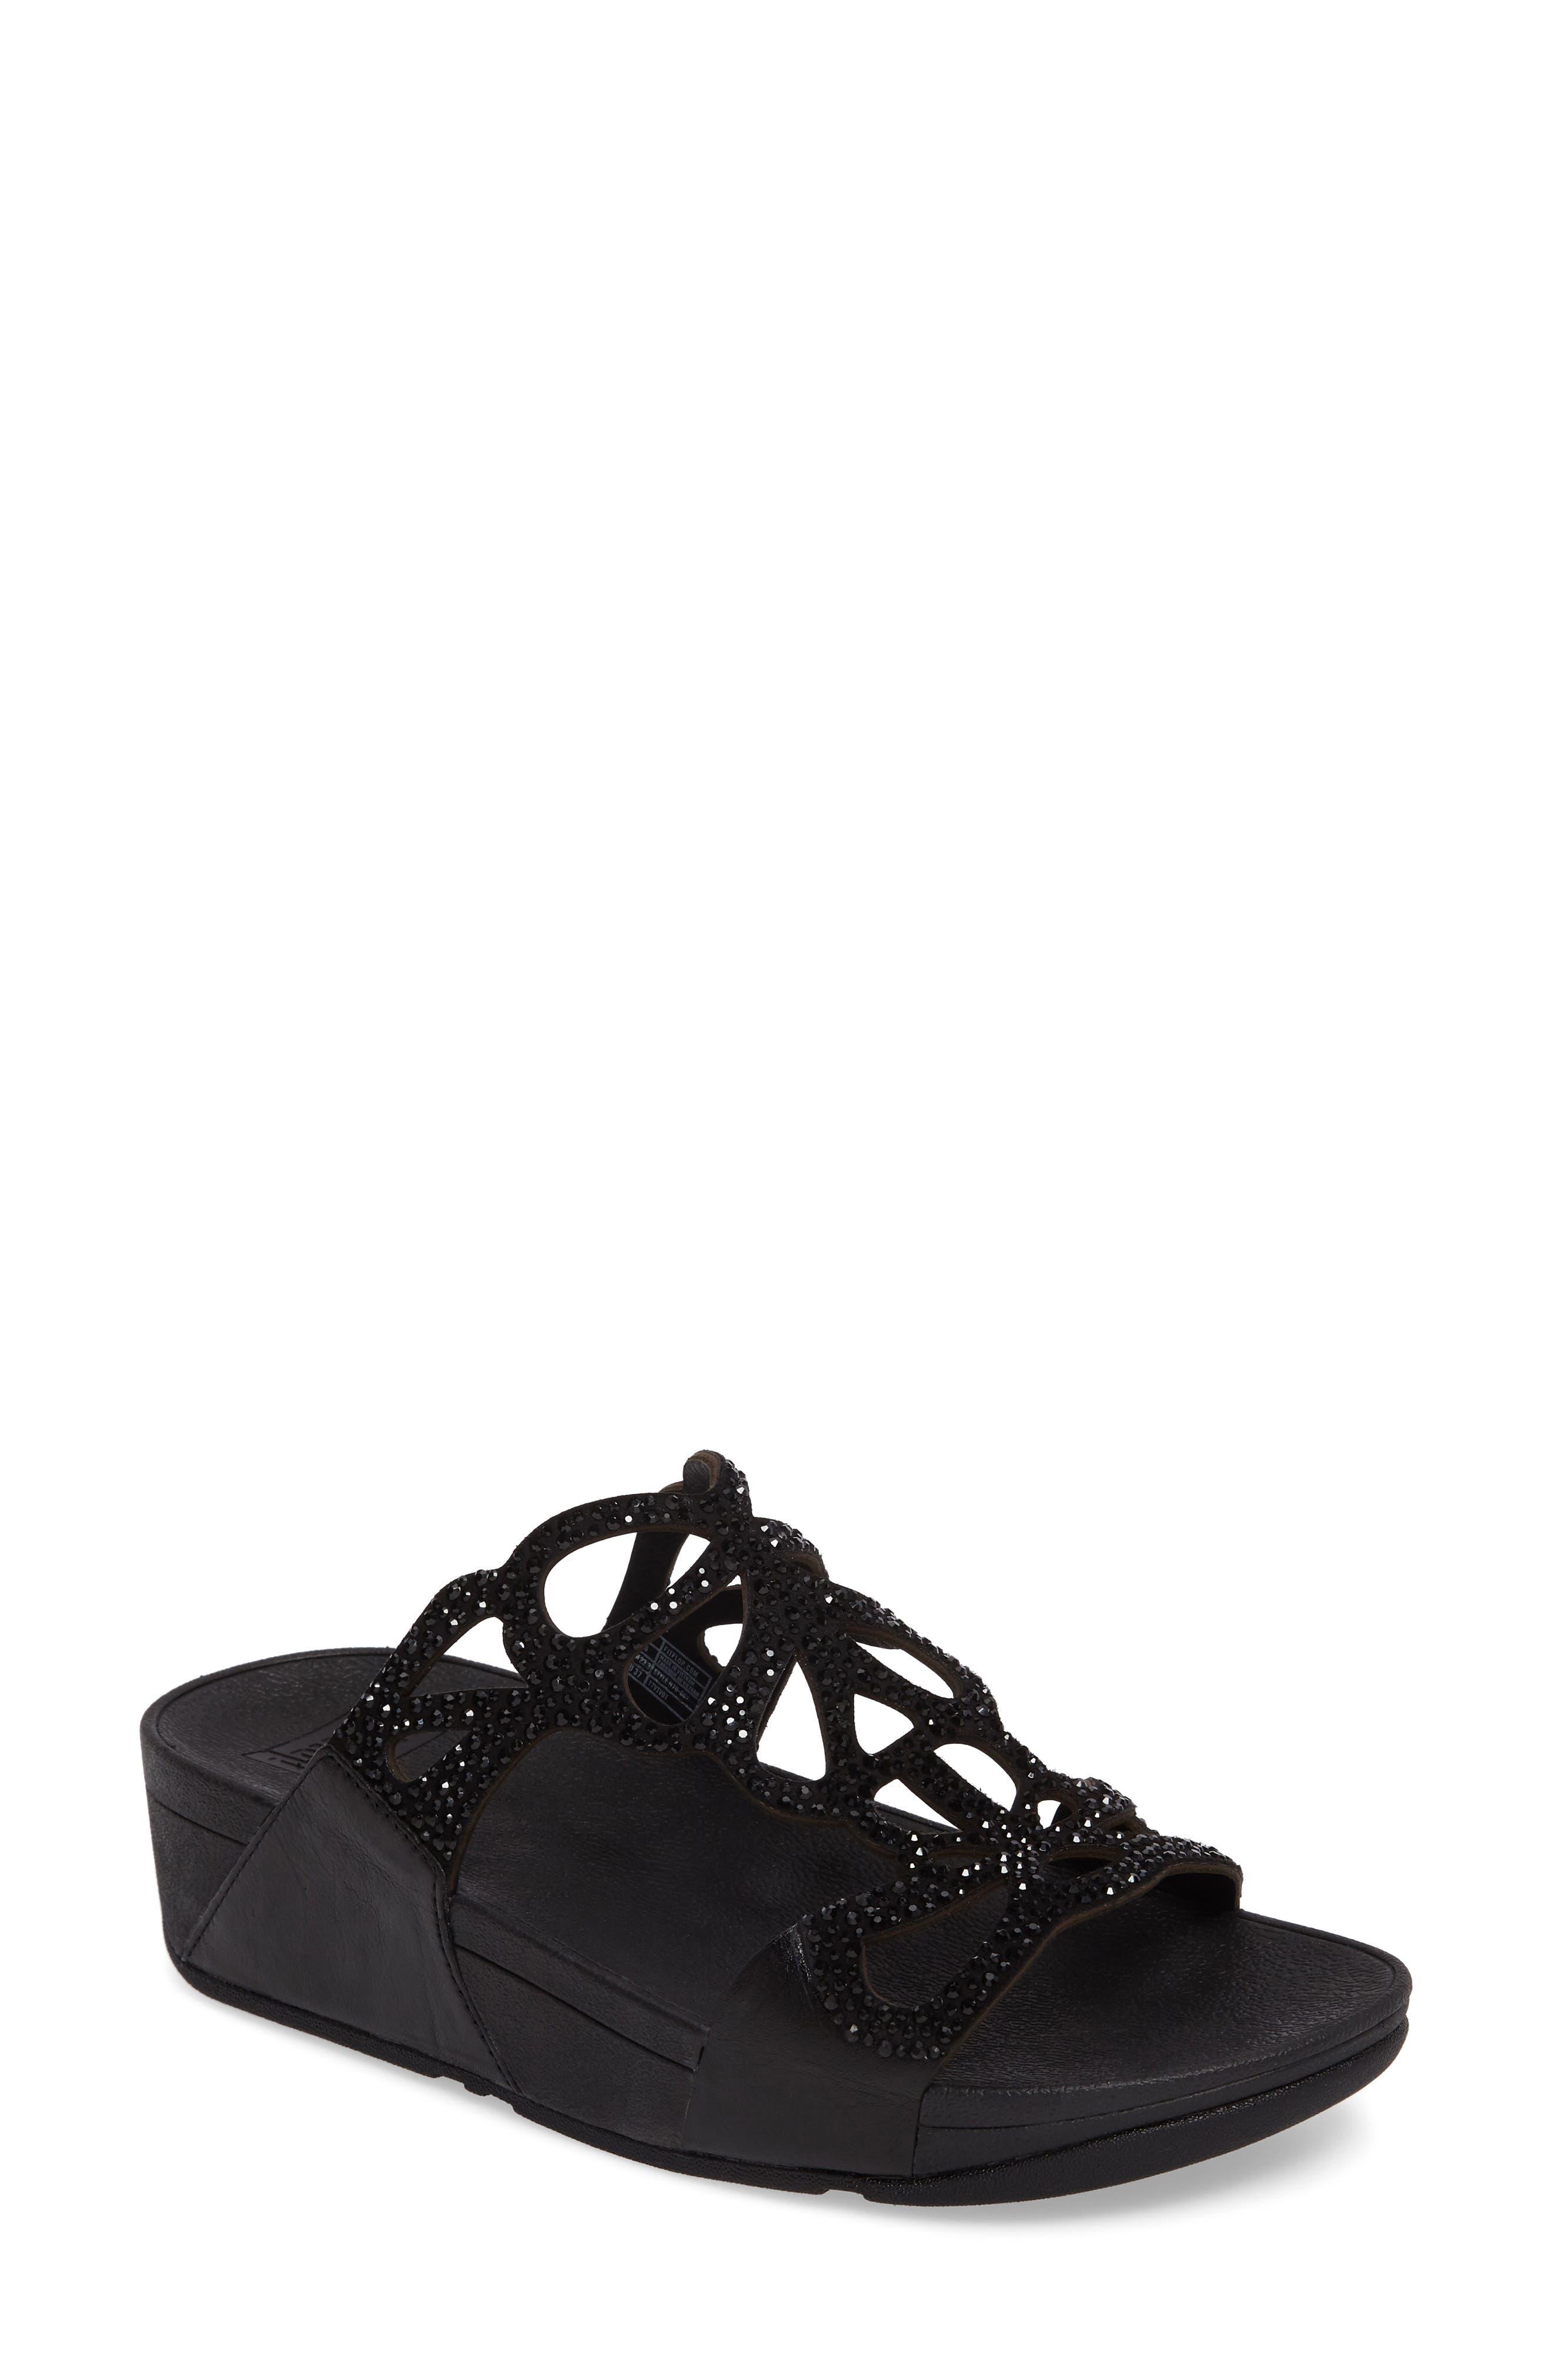 Bumble Wedge Slide Sandal,                         Main,                         color, Black Leather